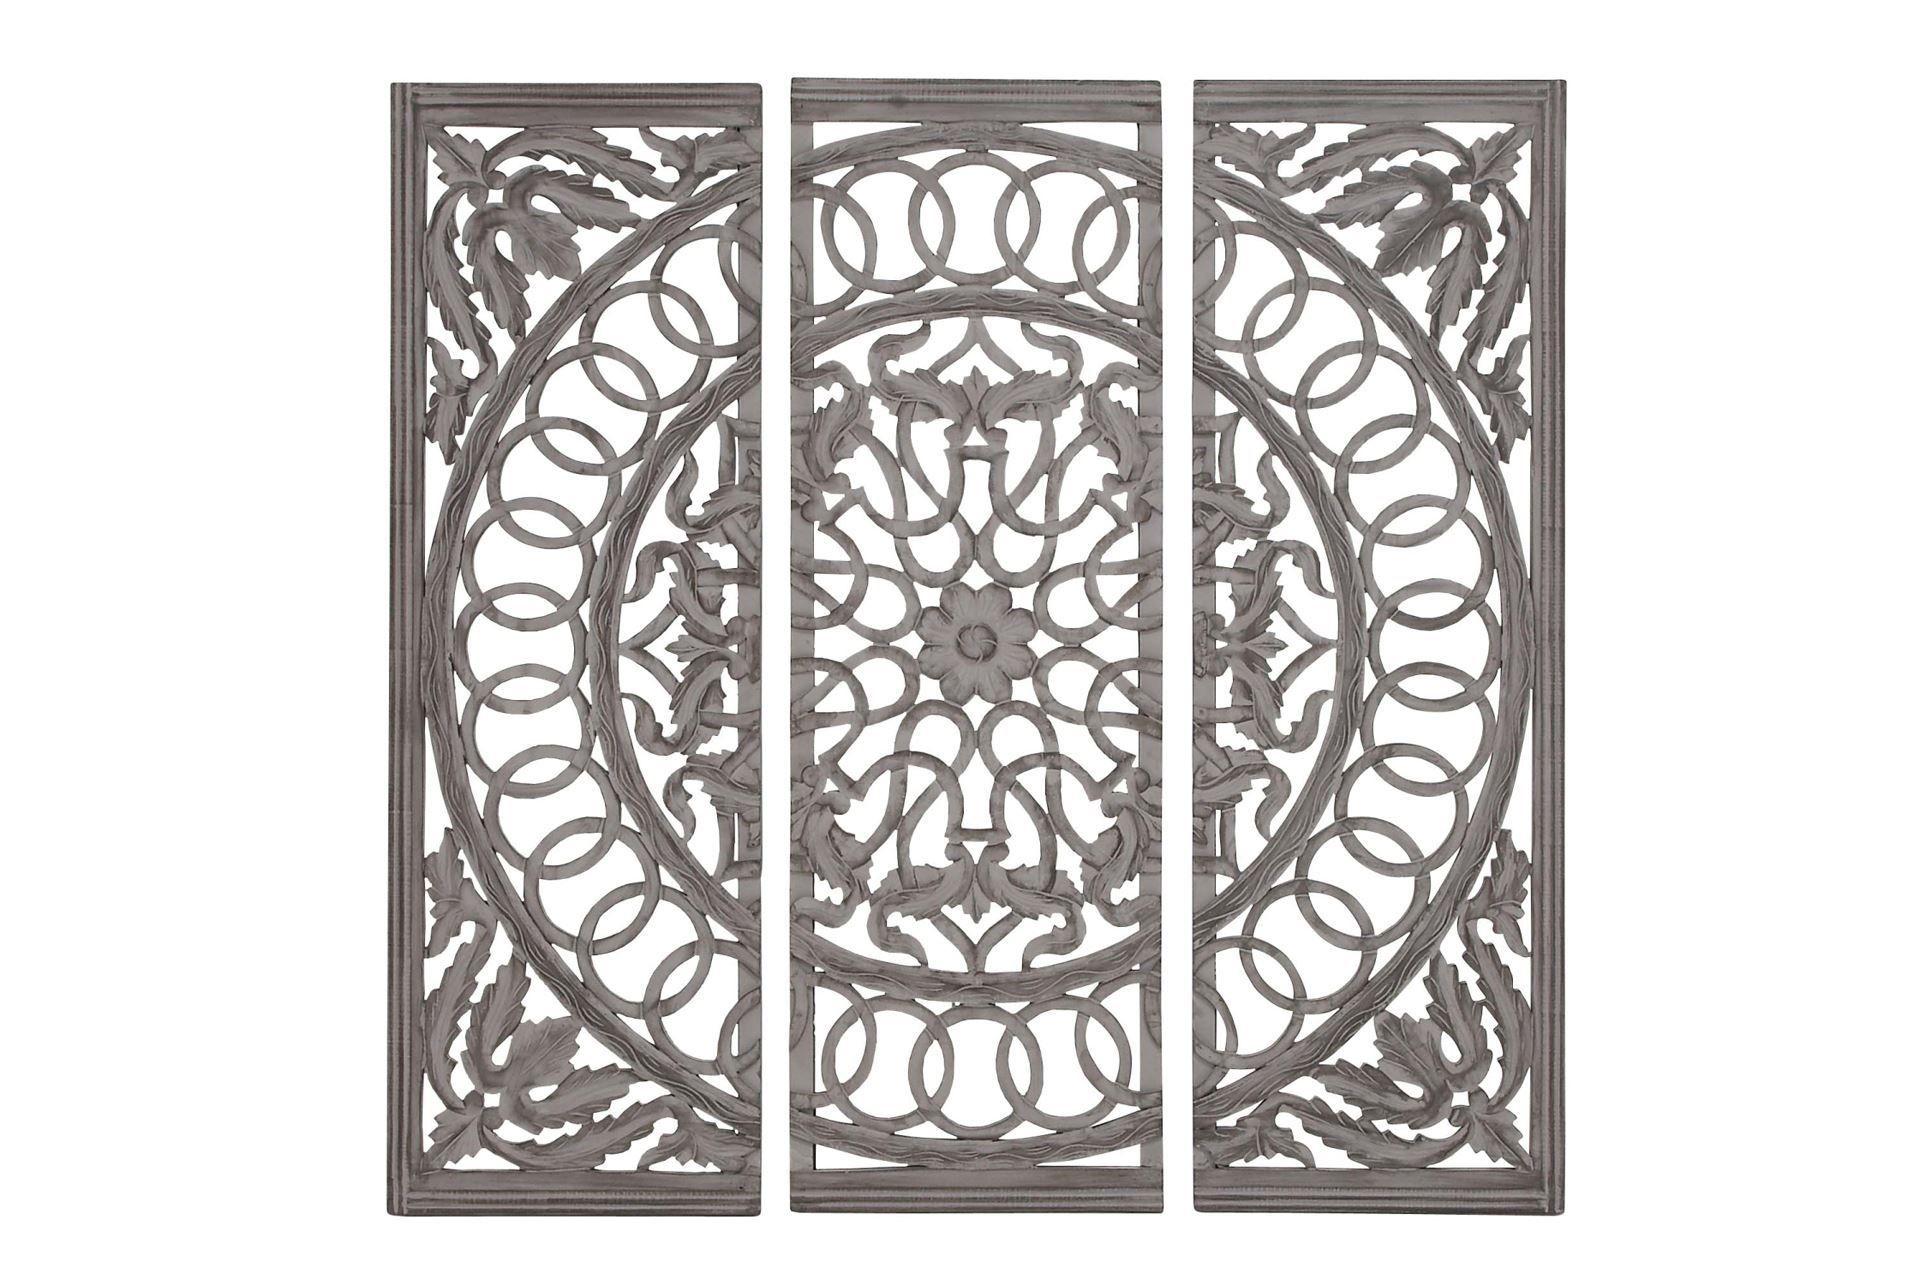 3 Piece Wood Scroll Panels | Decorating Ideas | Wall Decor Inside Scroll Panel Wall Decor (View 2 of 30)